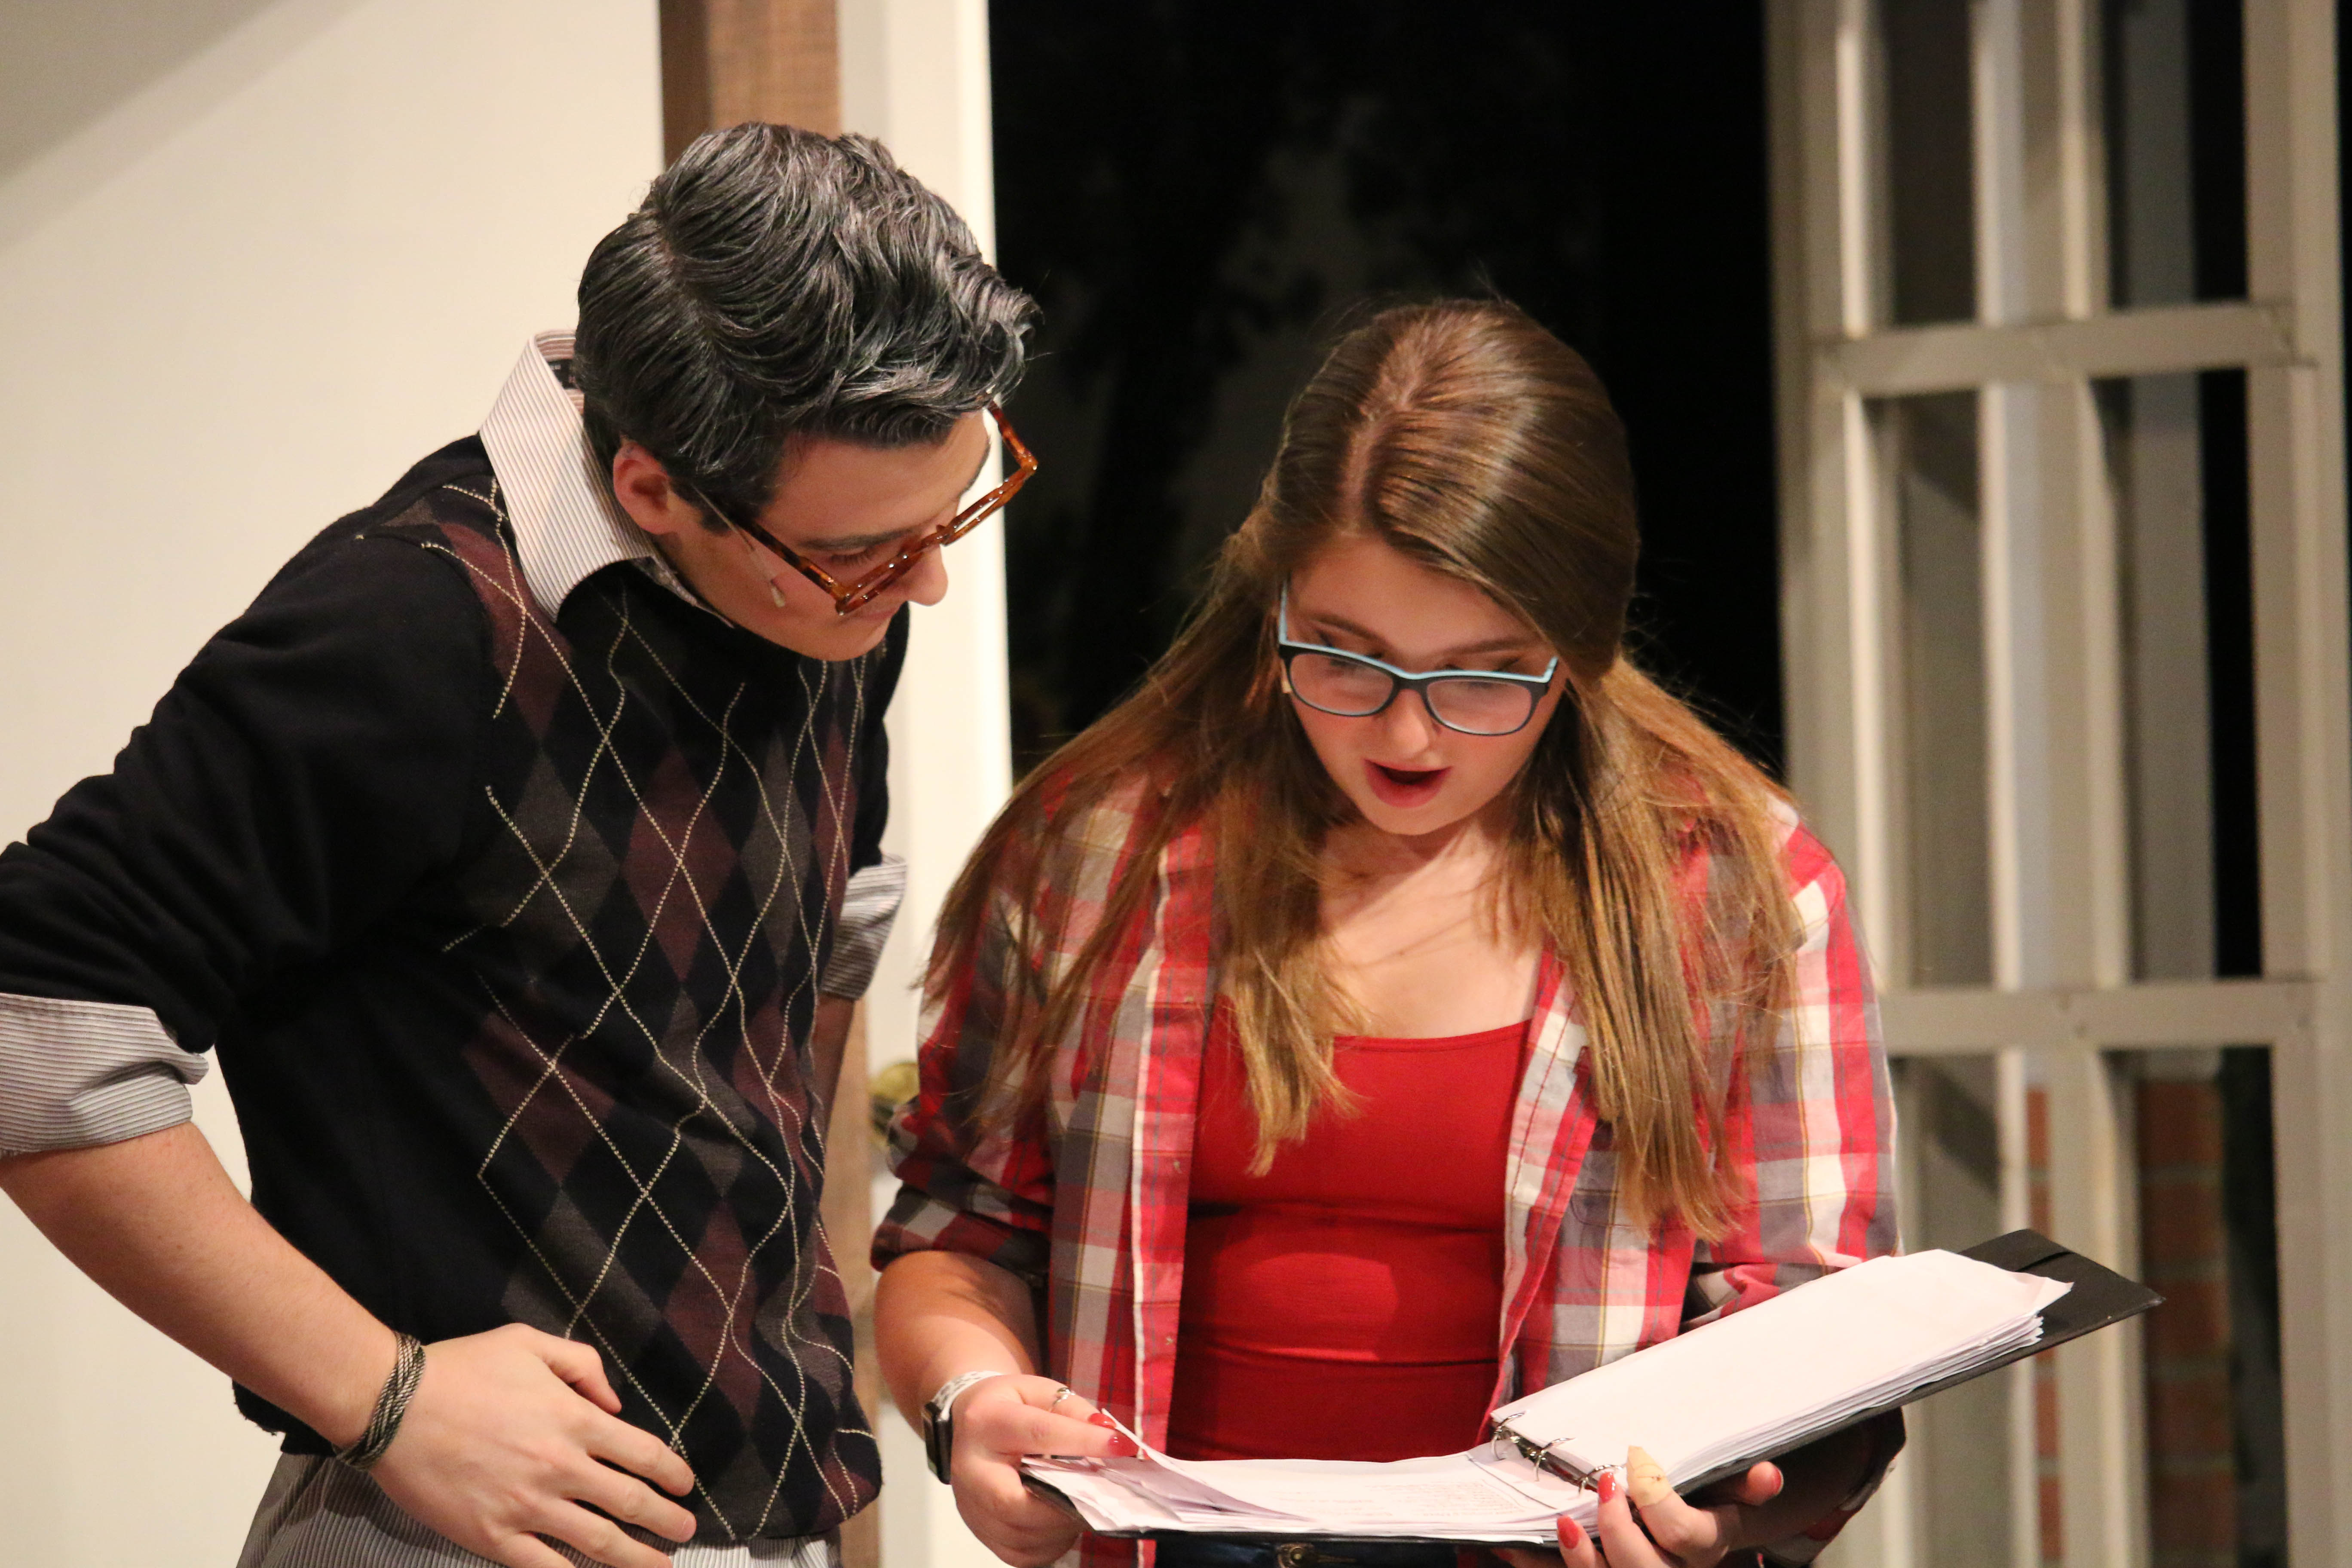 Proctor Academy Theater Arts Drama Boarding School New England